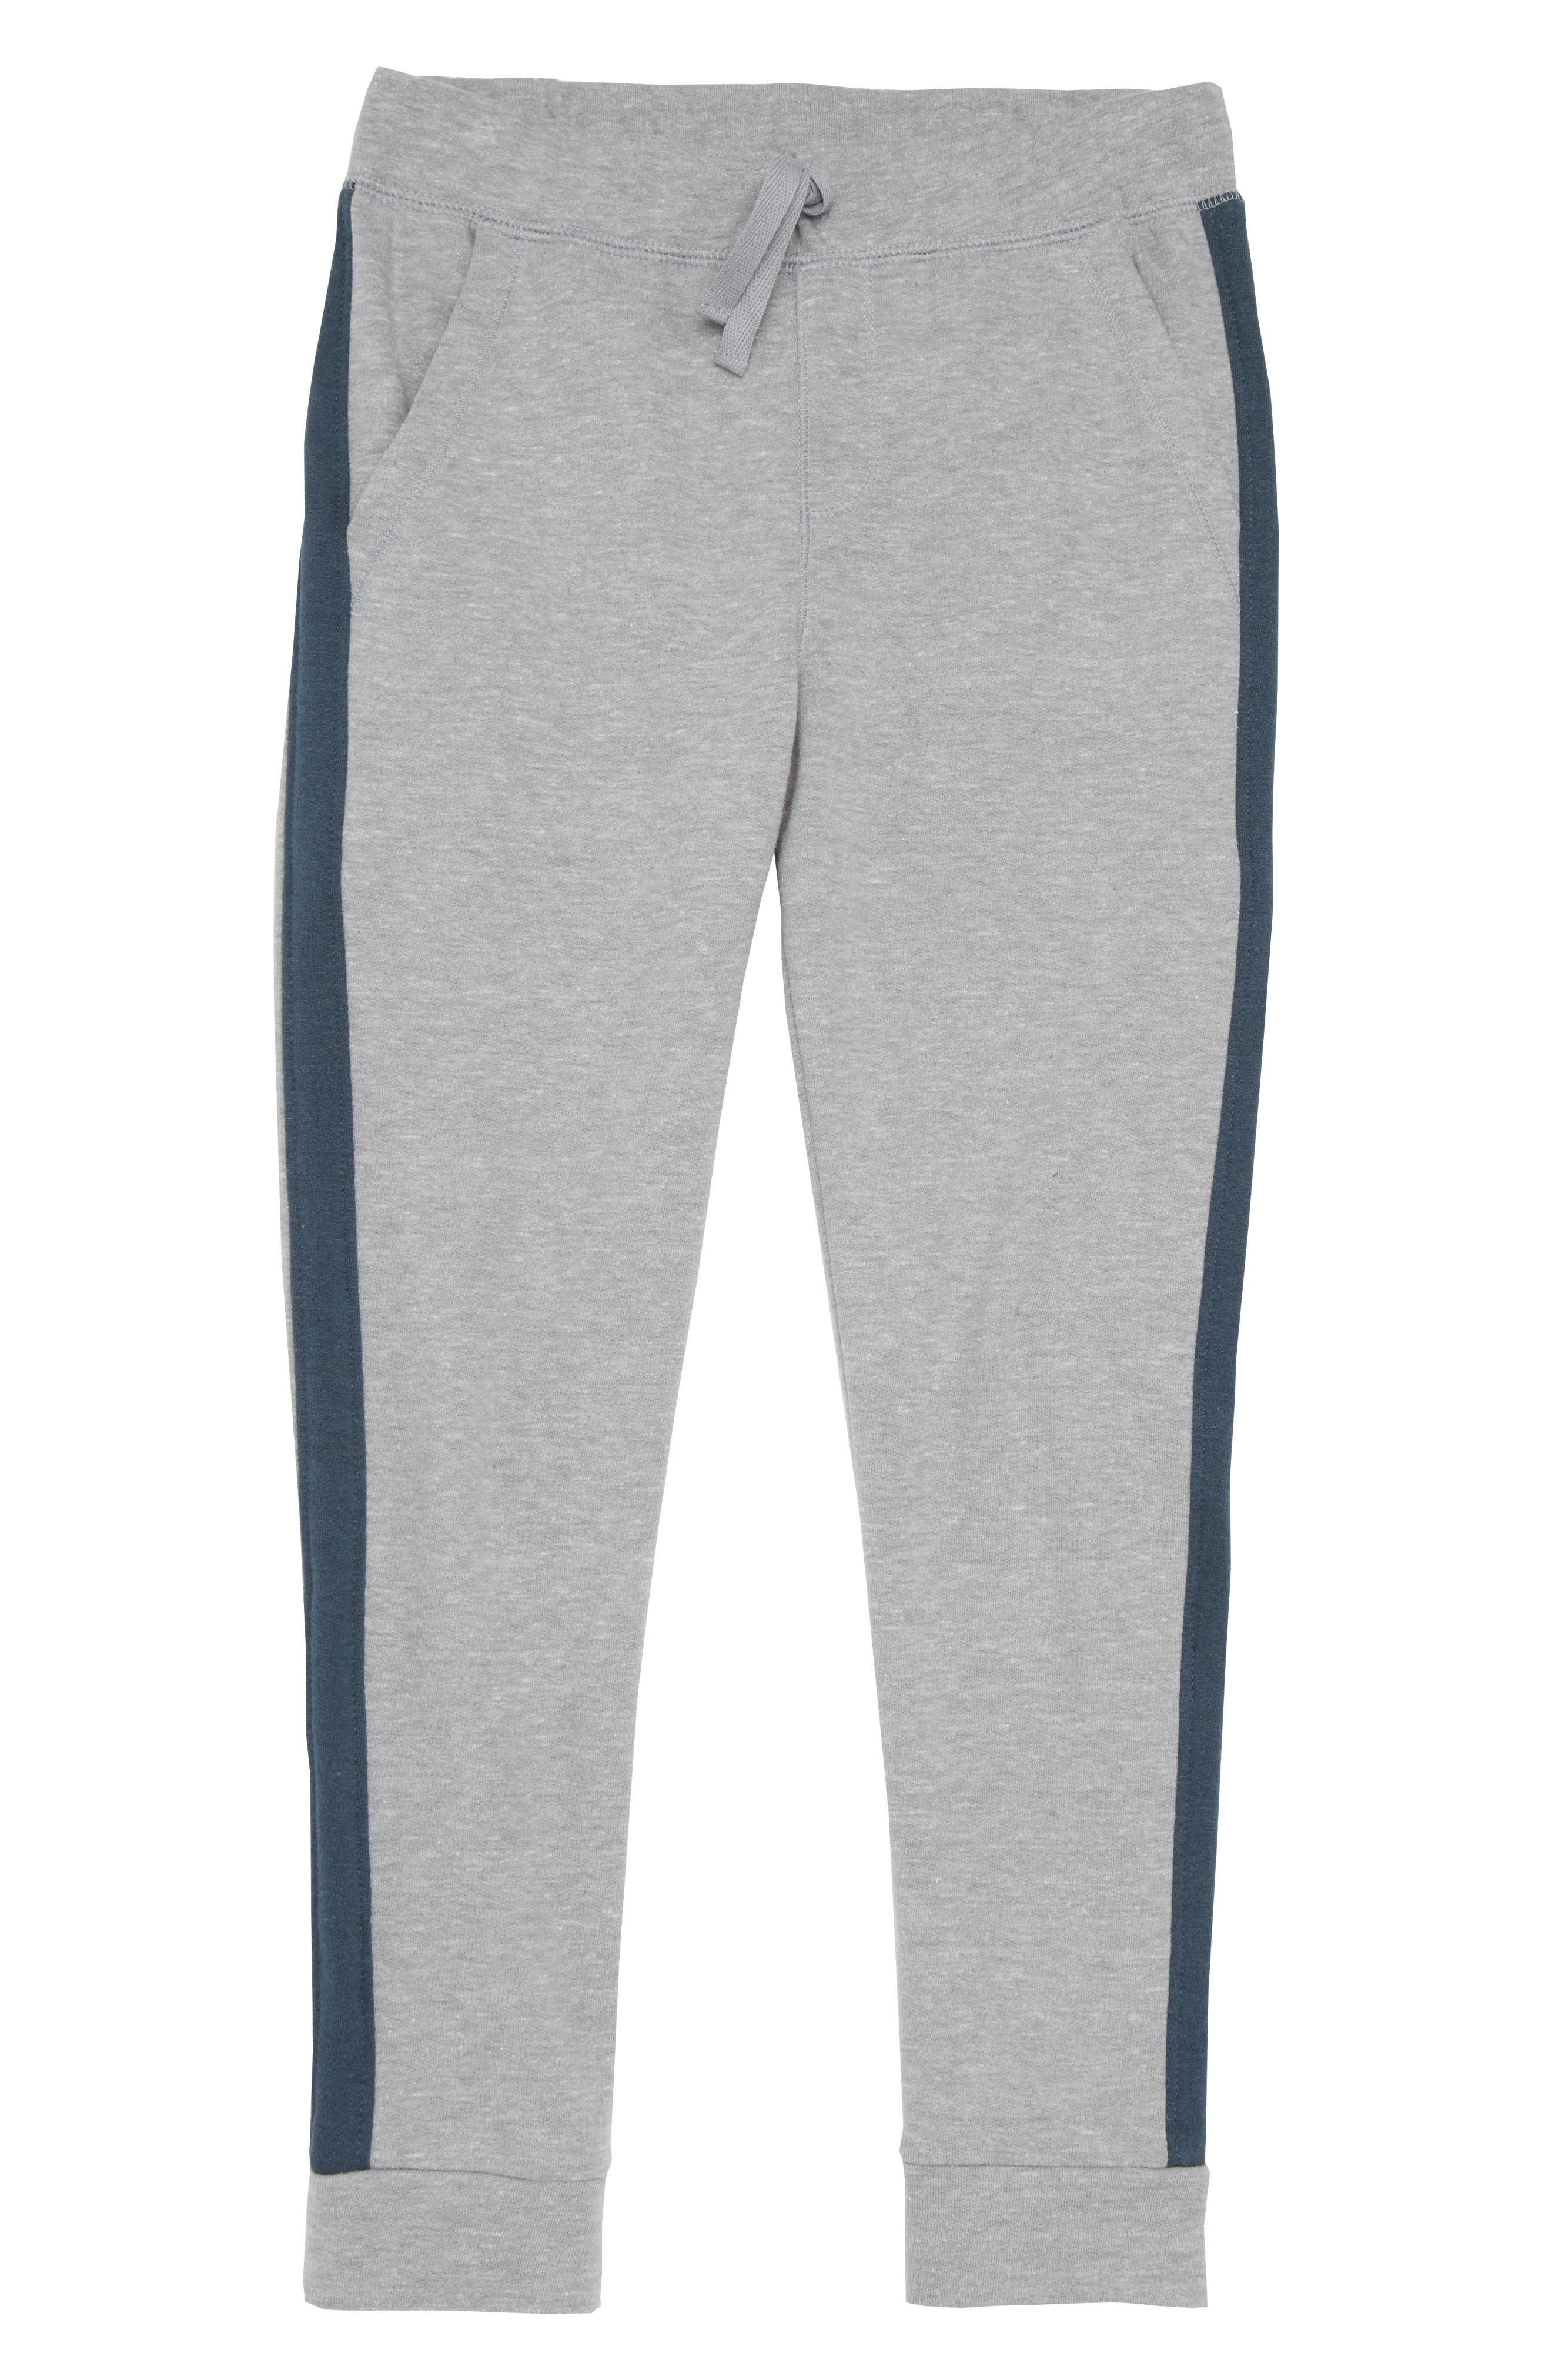 Varsity Fleece Jogger Pants,                         Main,                         color, 030